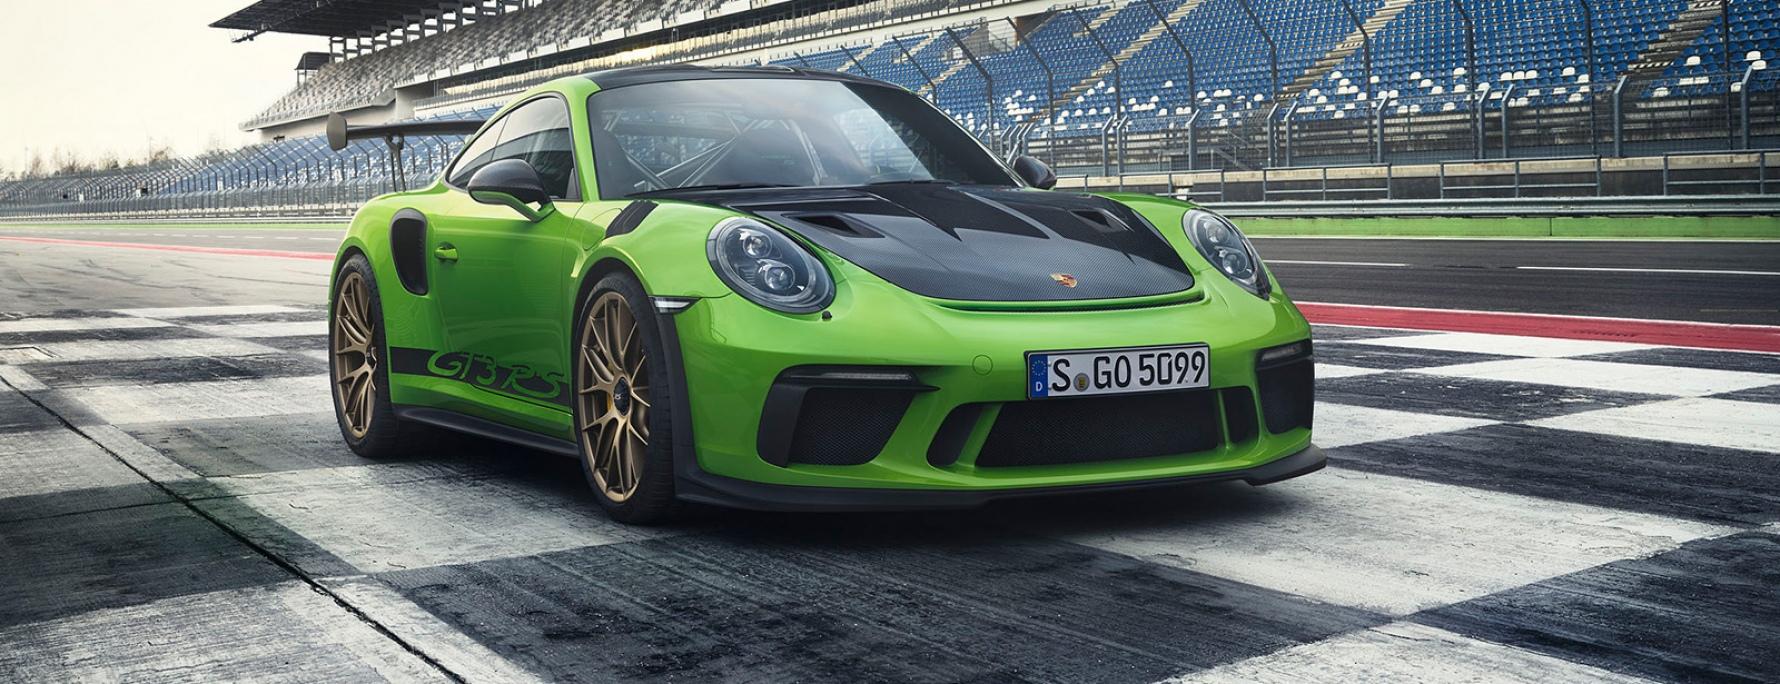 O Novo 911 Gt3 Rs Estabelece Padroes Na Precisao De Direcao Porsche 911 Gt3 Rs